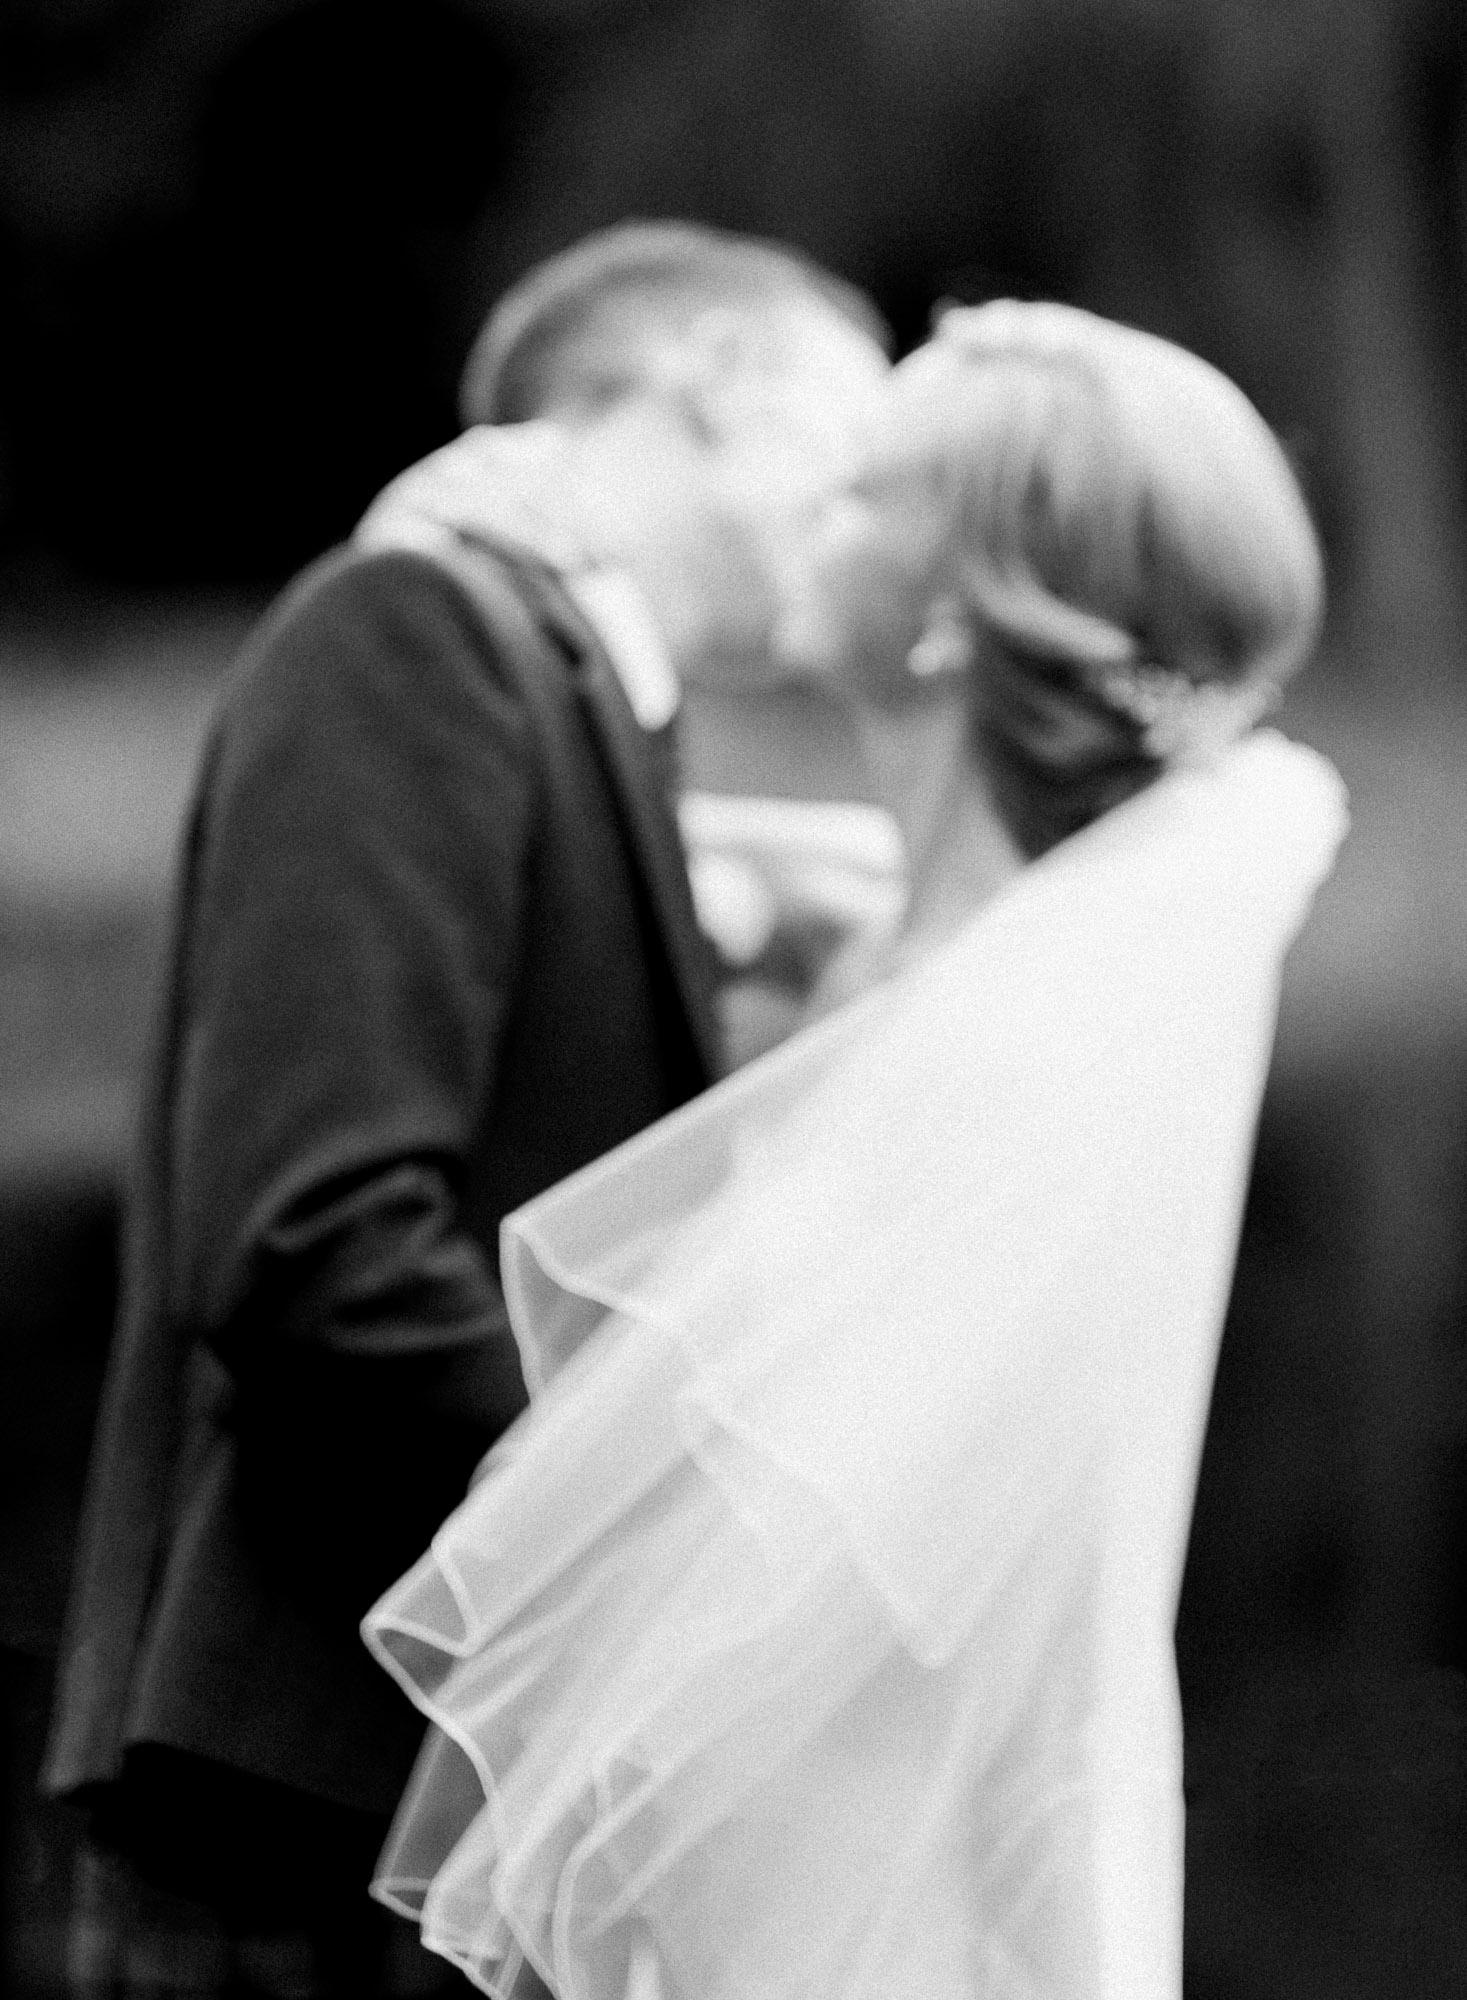 scottish_wedding_blairquhan_castle-79.jpg